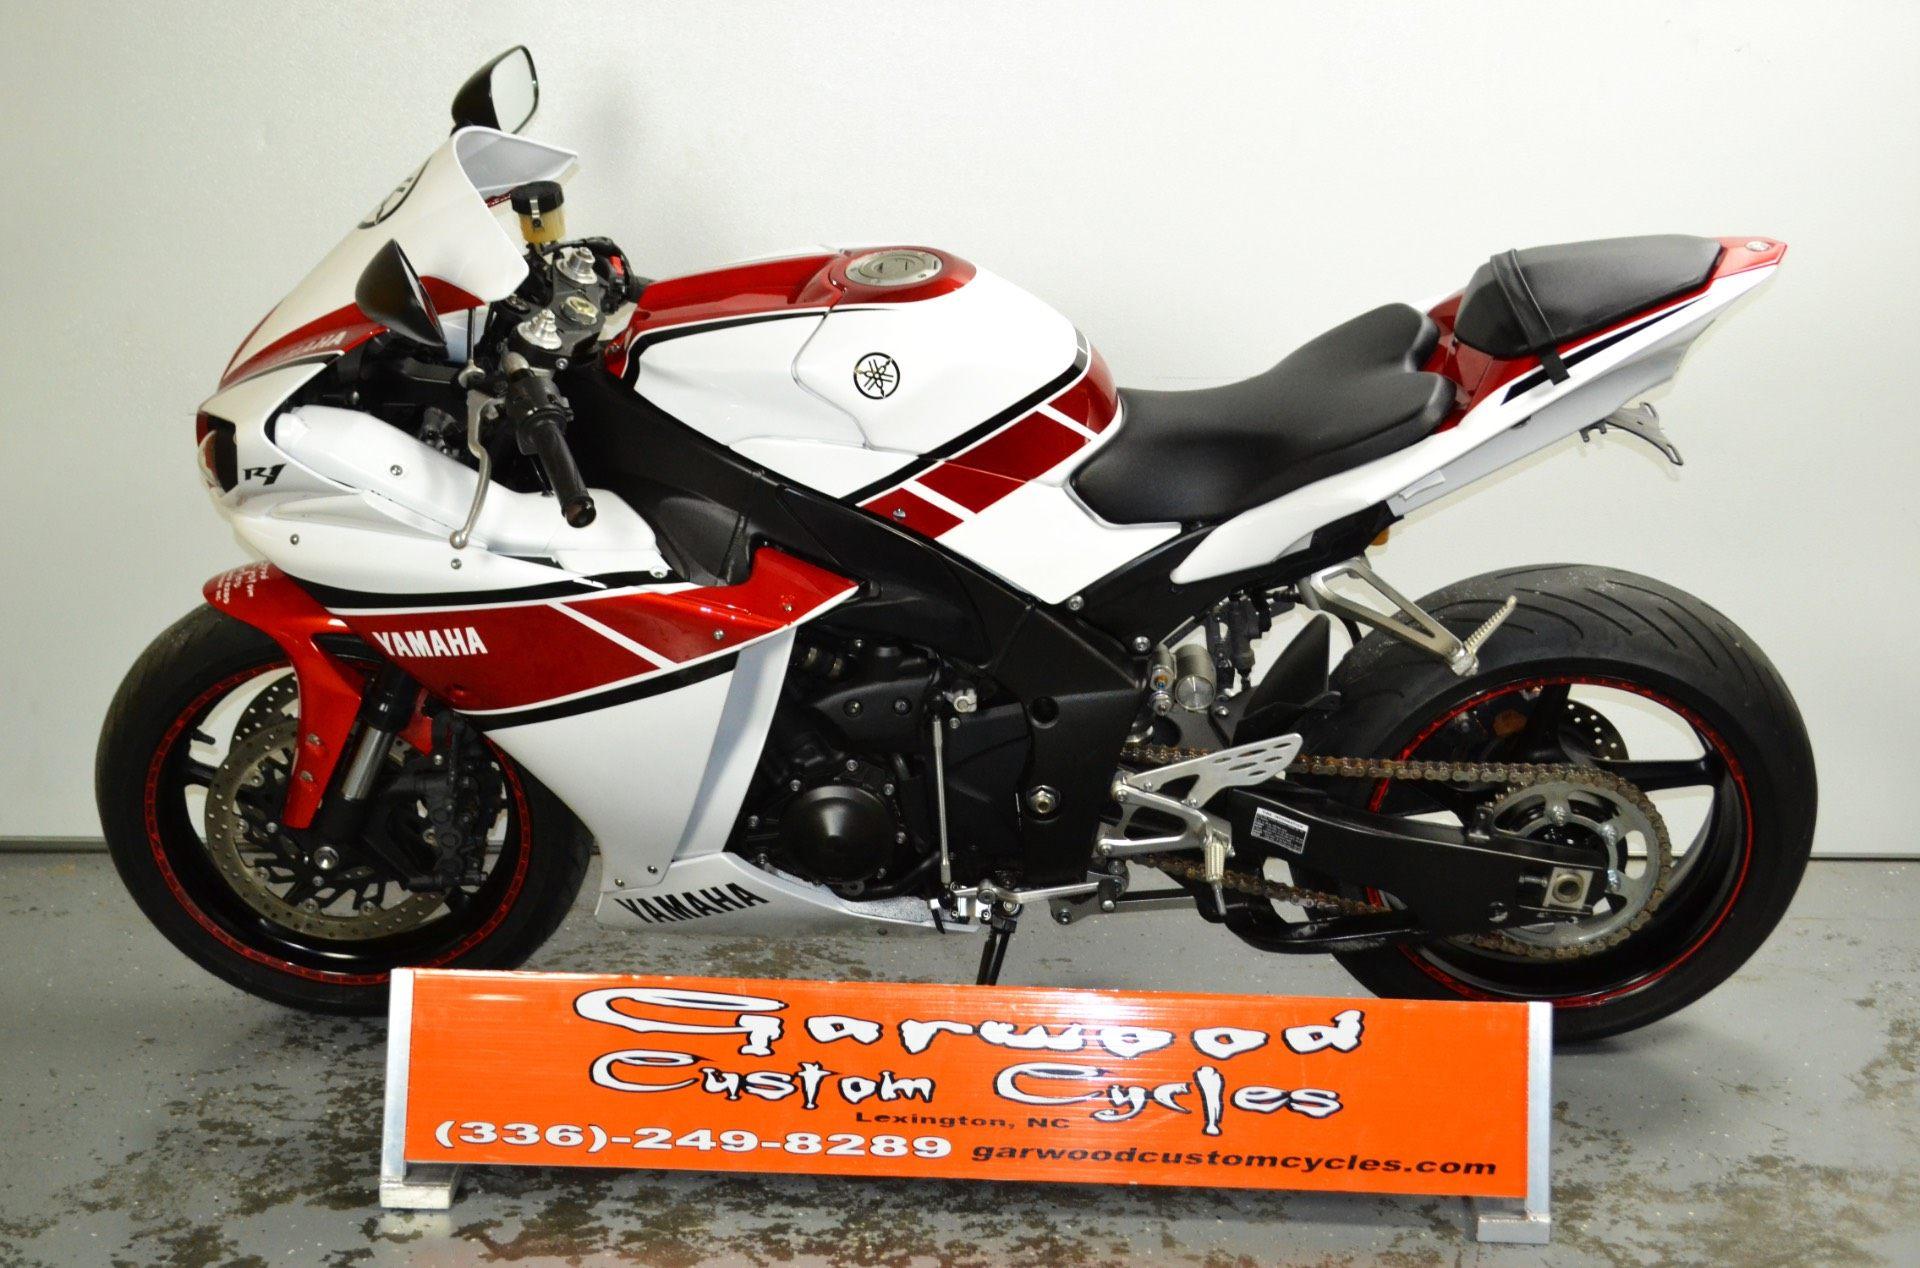 2011 Yamaha YZF-R1 in Lexington, North Carolina